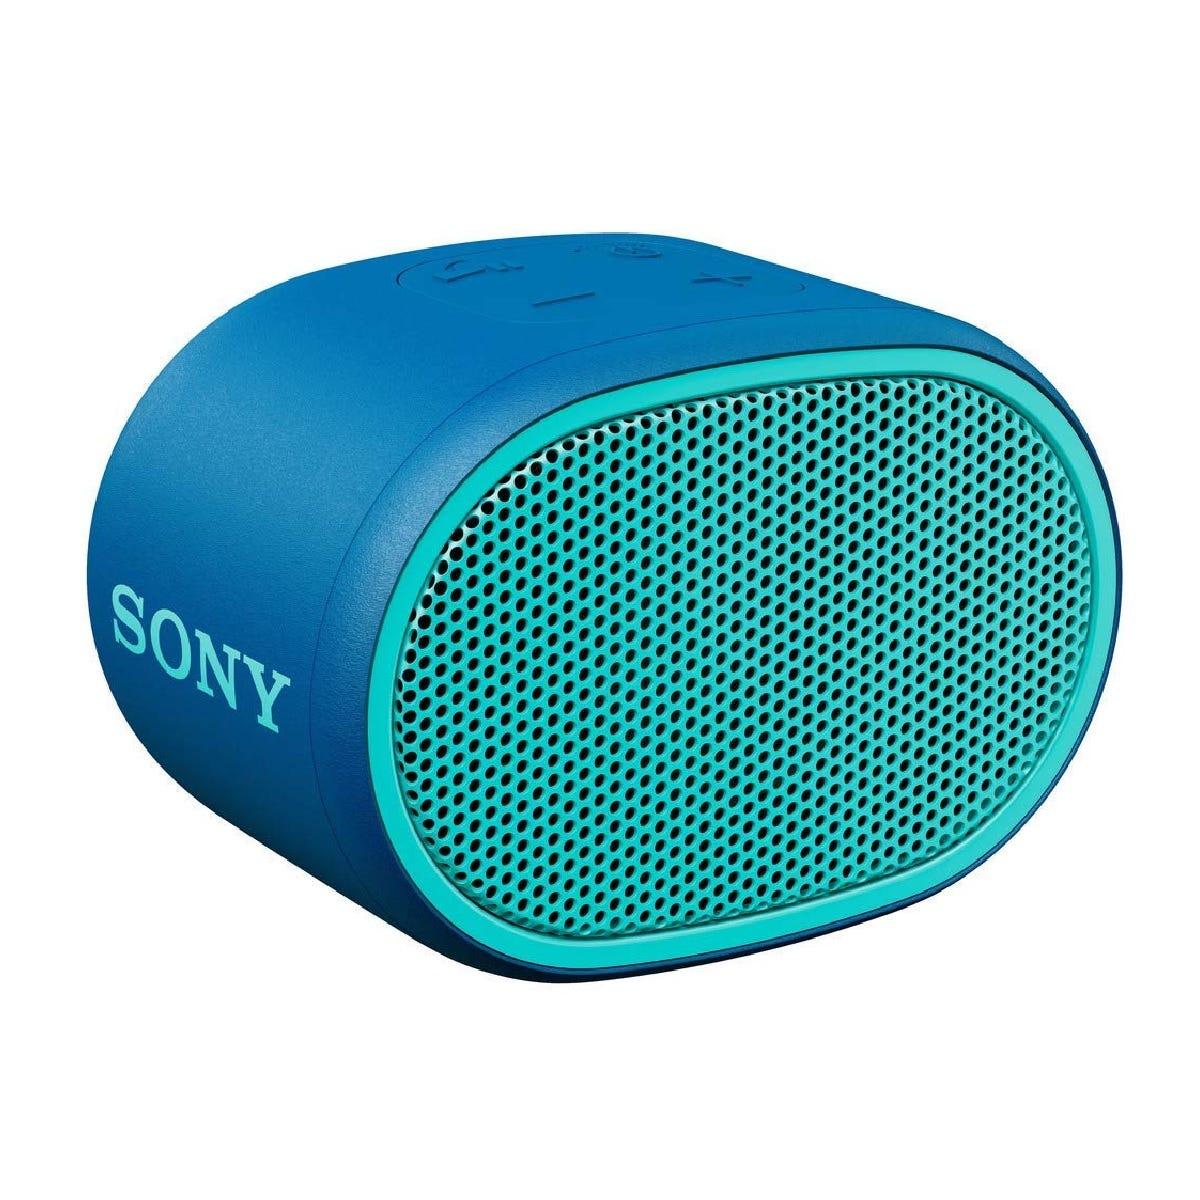 Sony Light Portable Bluetooth Speaker - Blue